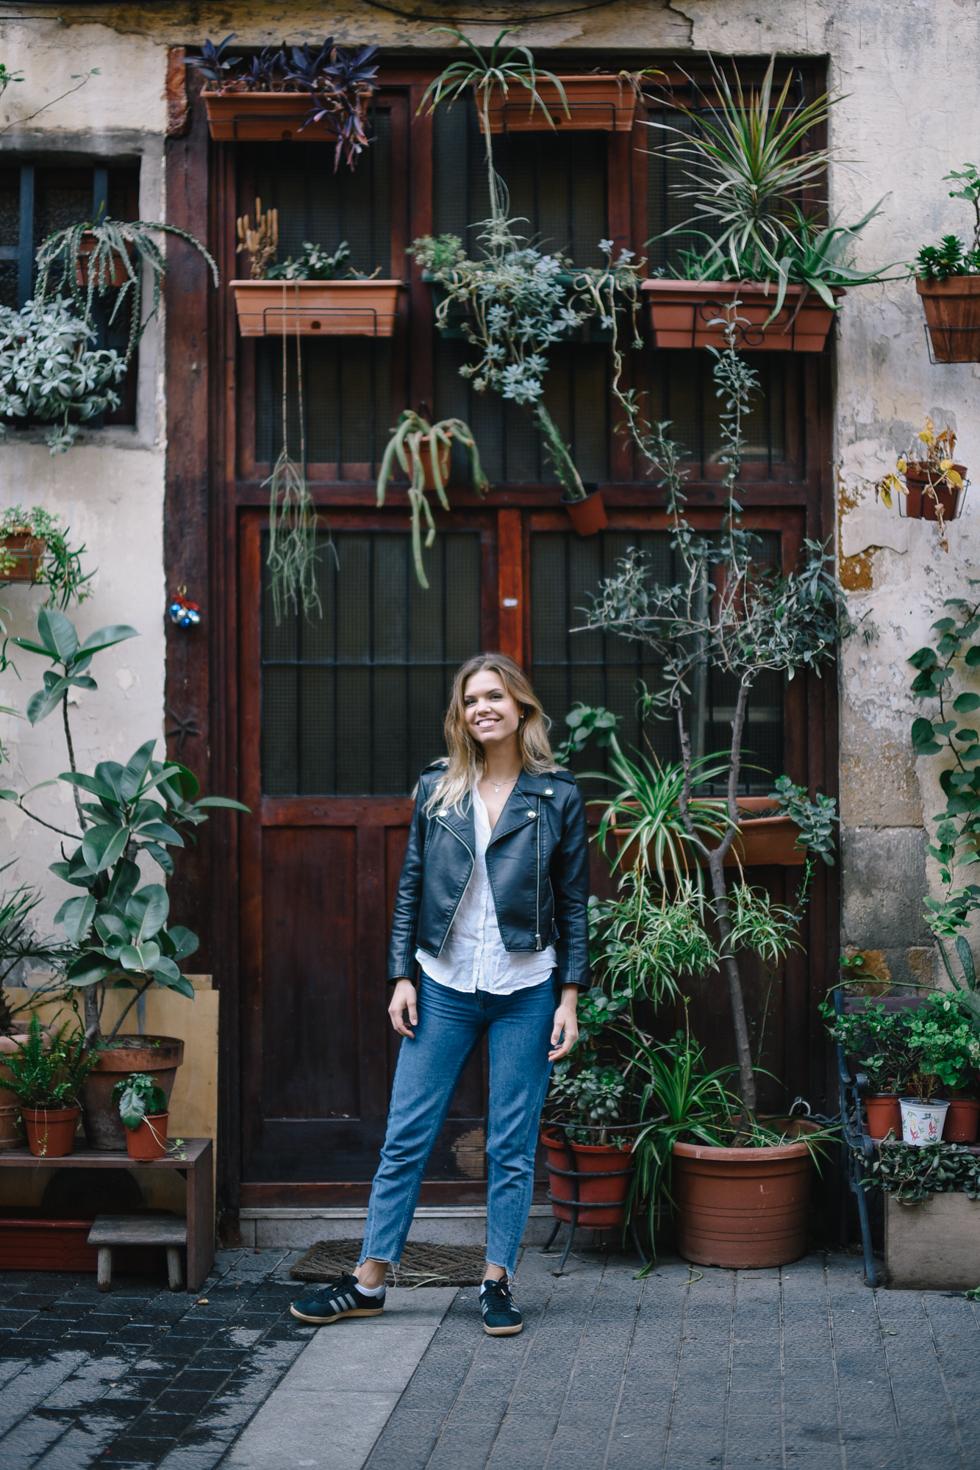 flora wiström barcelona1